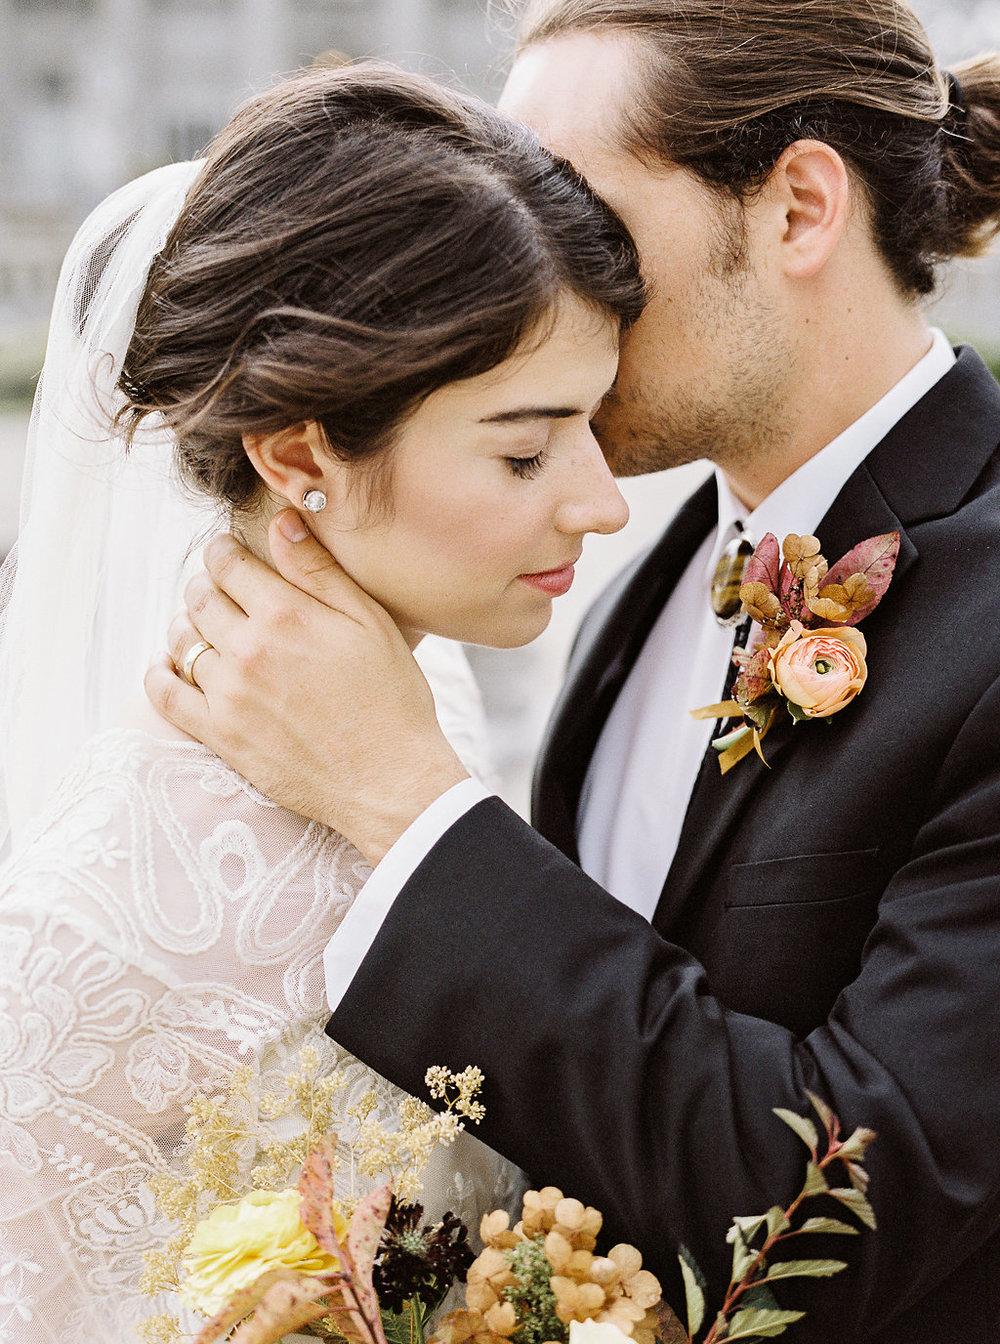 fall-wedding-Jenny-haas-Samantha-joy-events-laurel-court-cincinnati-wedding-bride-and-groom